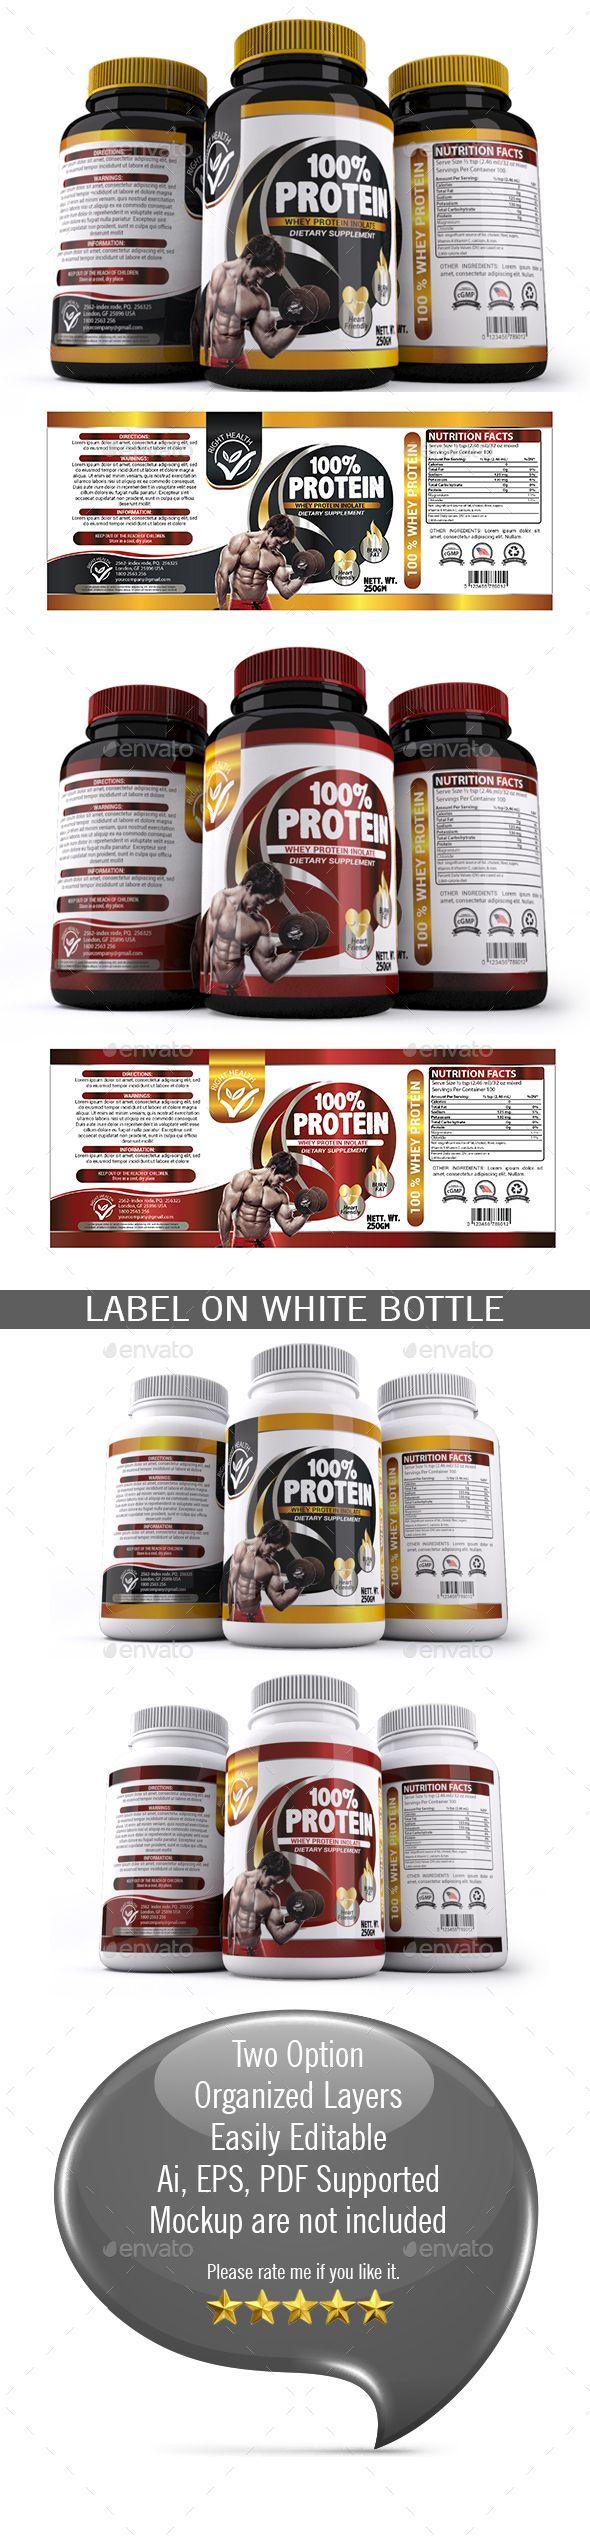 Supplement Label Template - 016 | Label templates, Ai illustrator ...